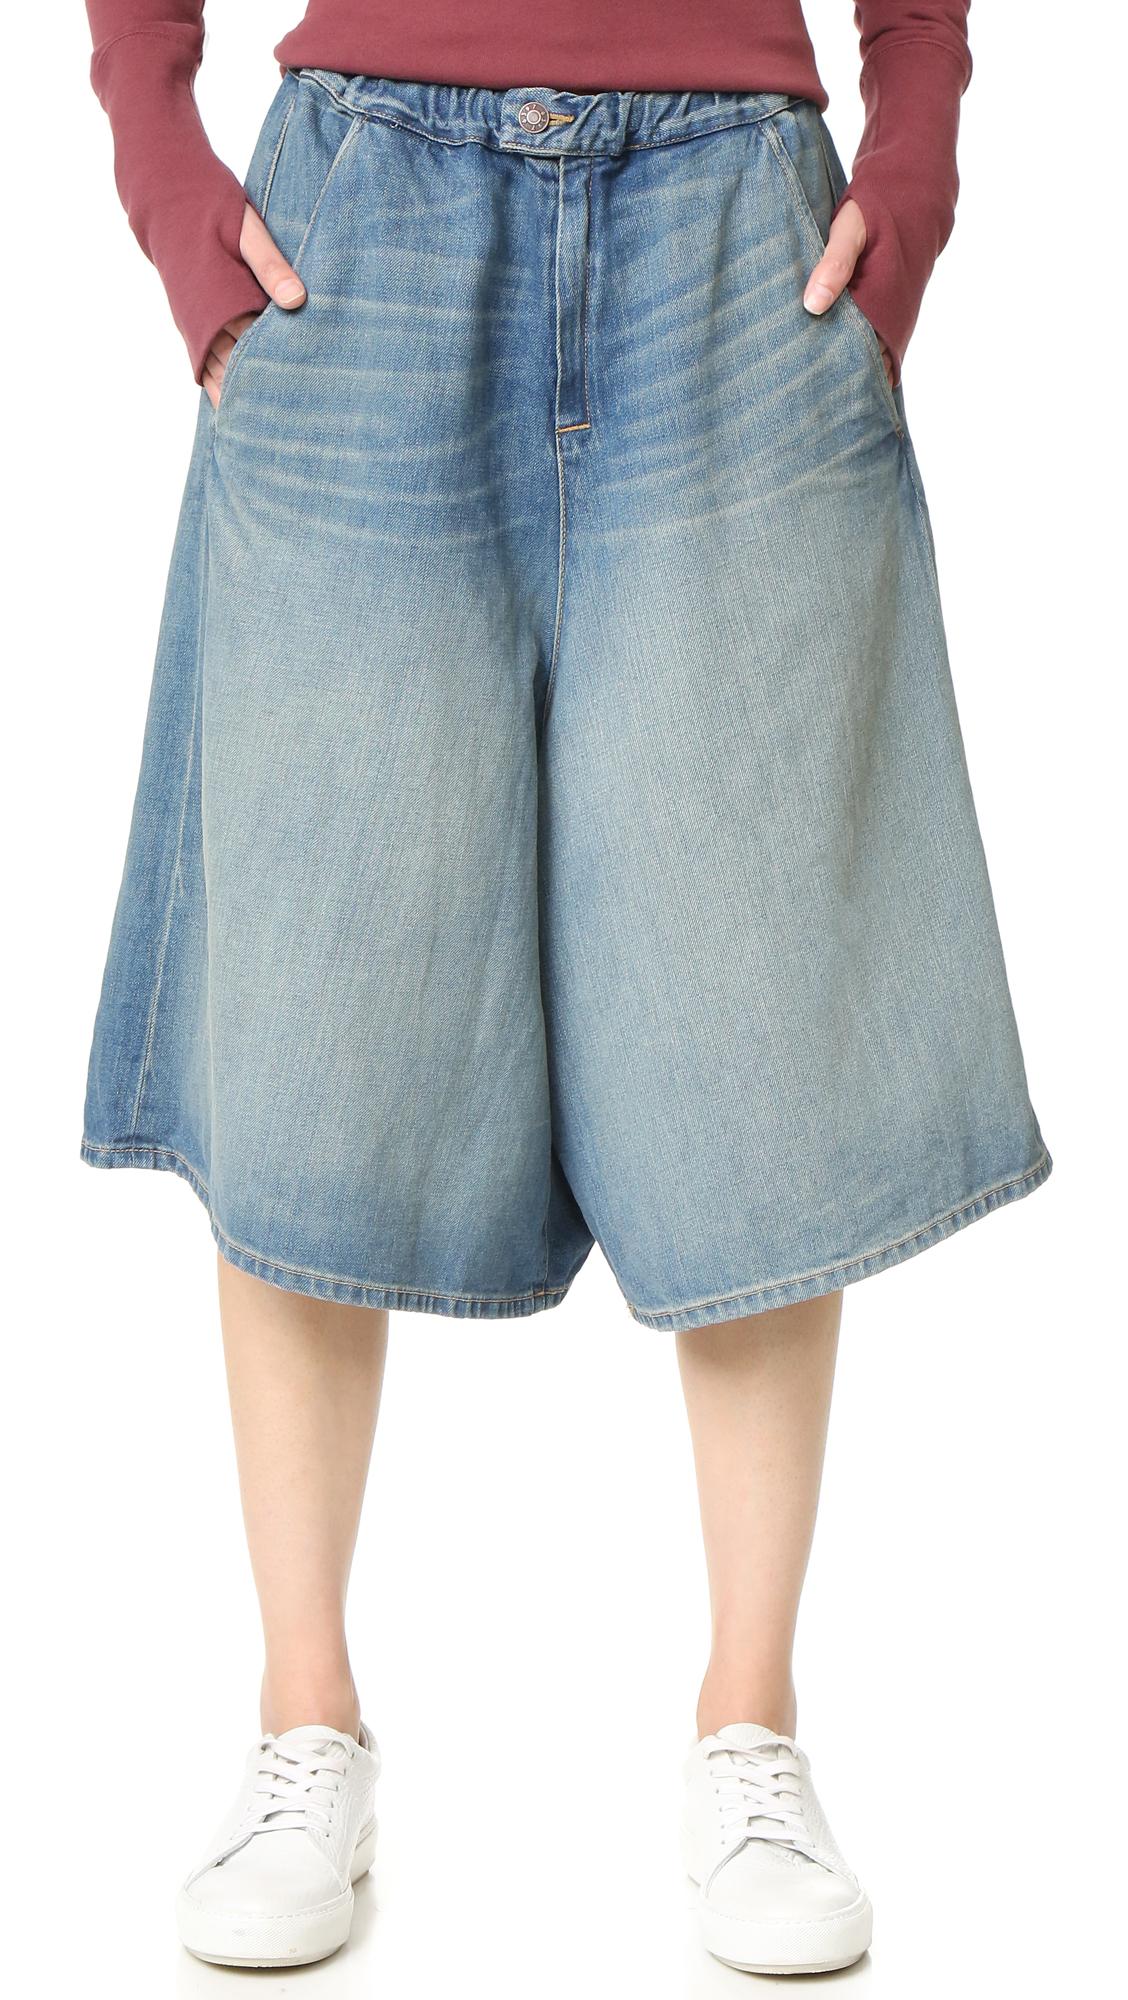 6397 female 6397 denim shorts worker wash